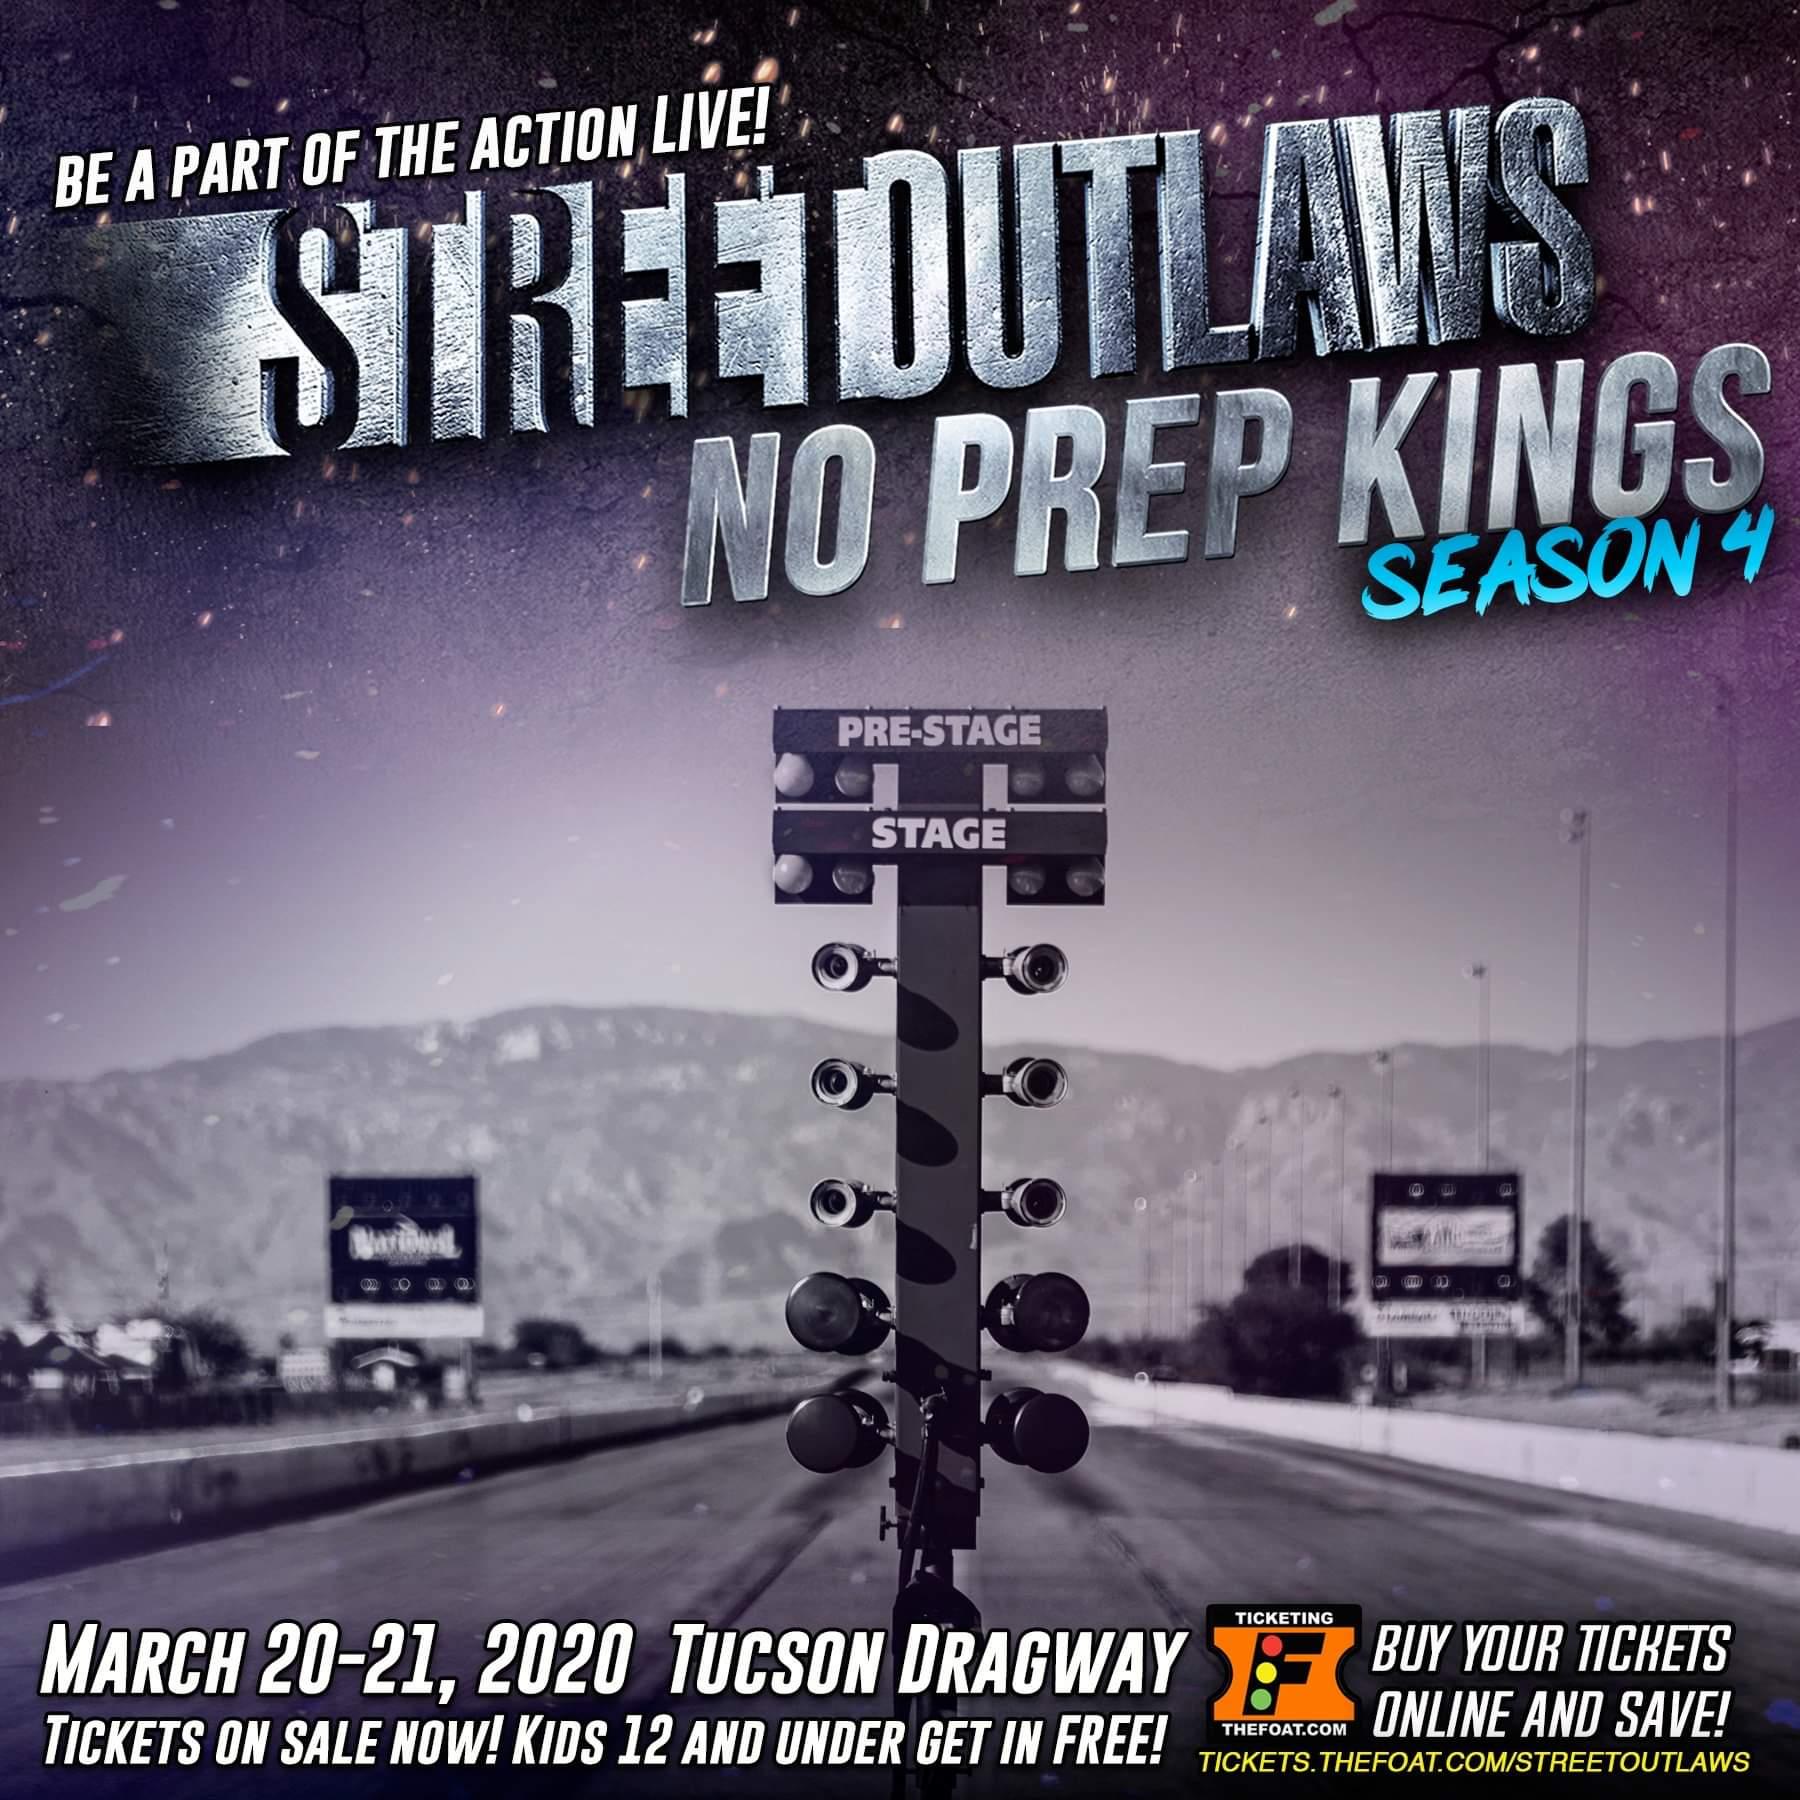 Street Outlaws No Prep Kings Tucson Dragway